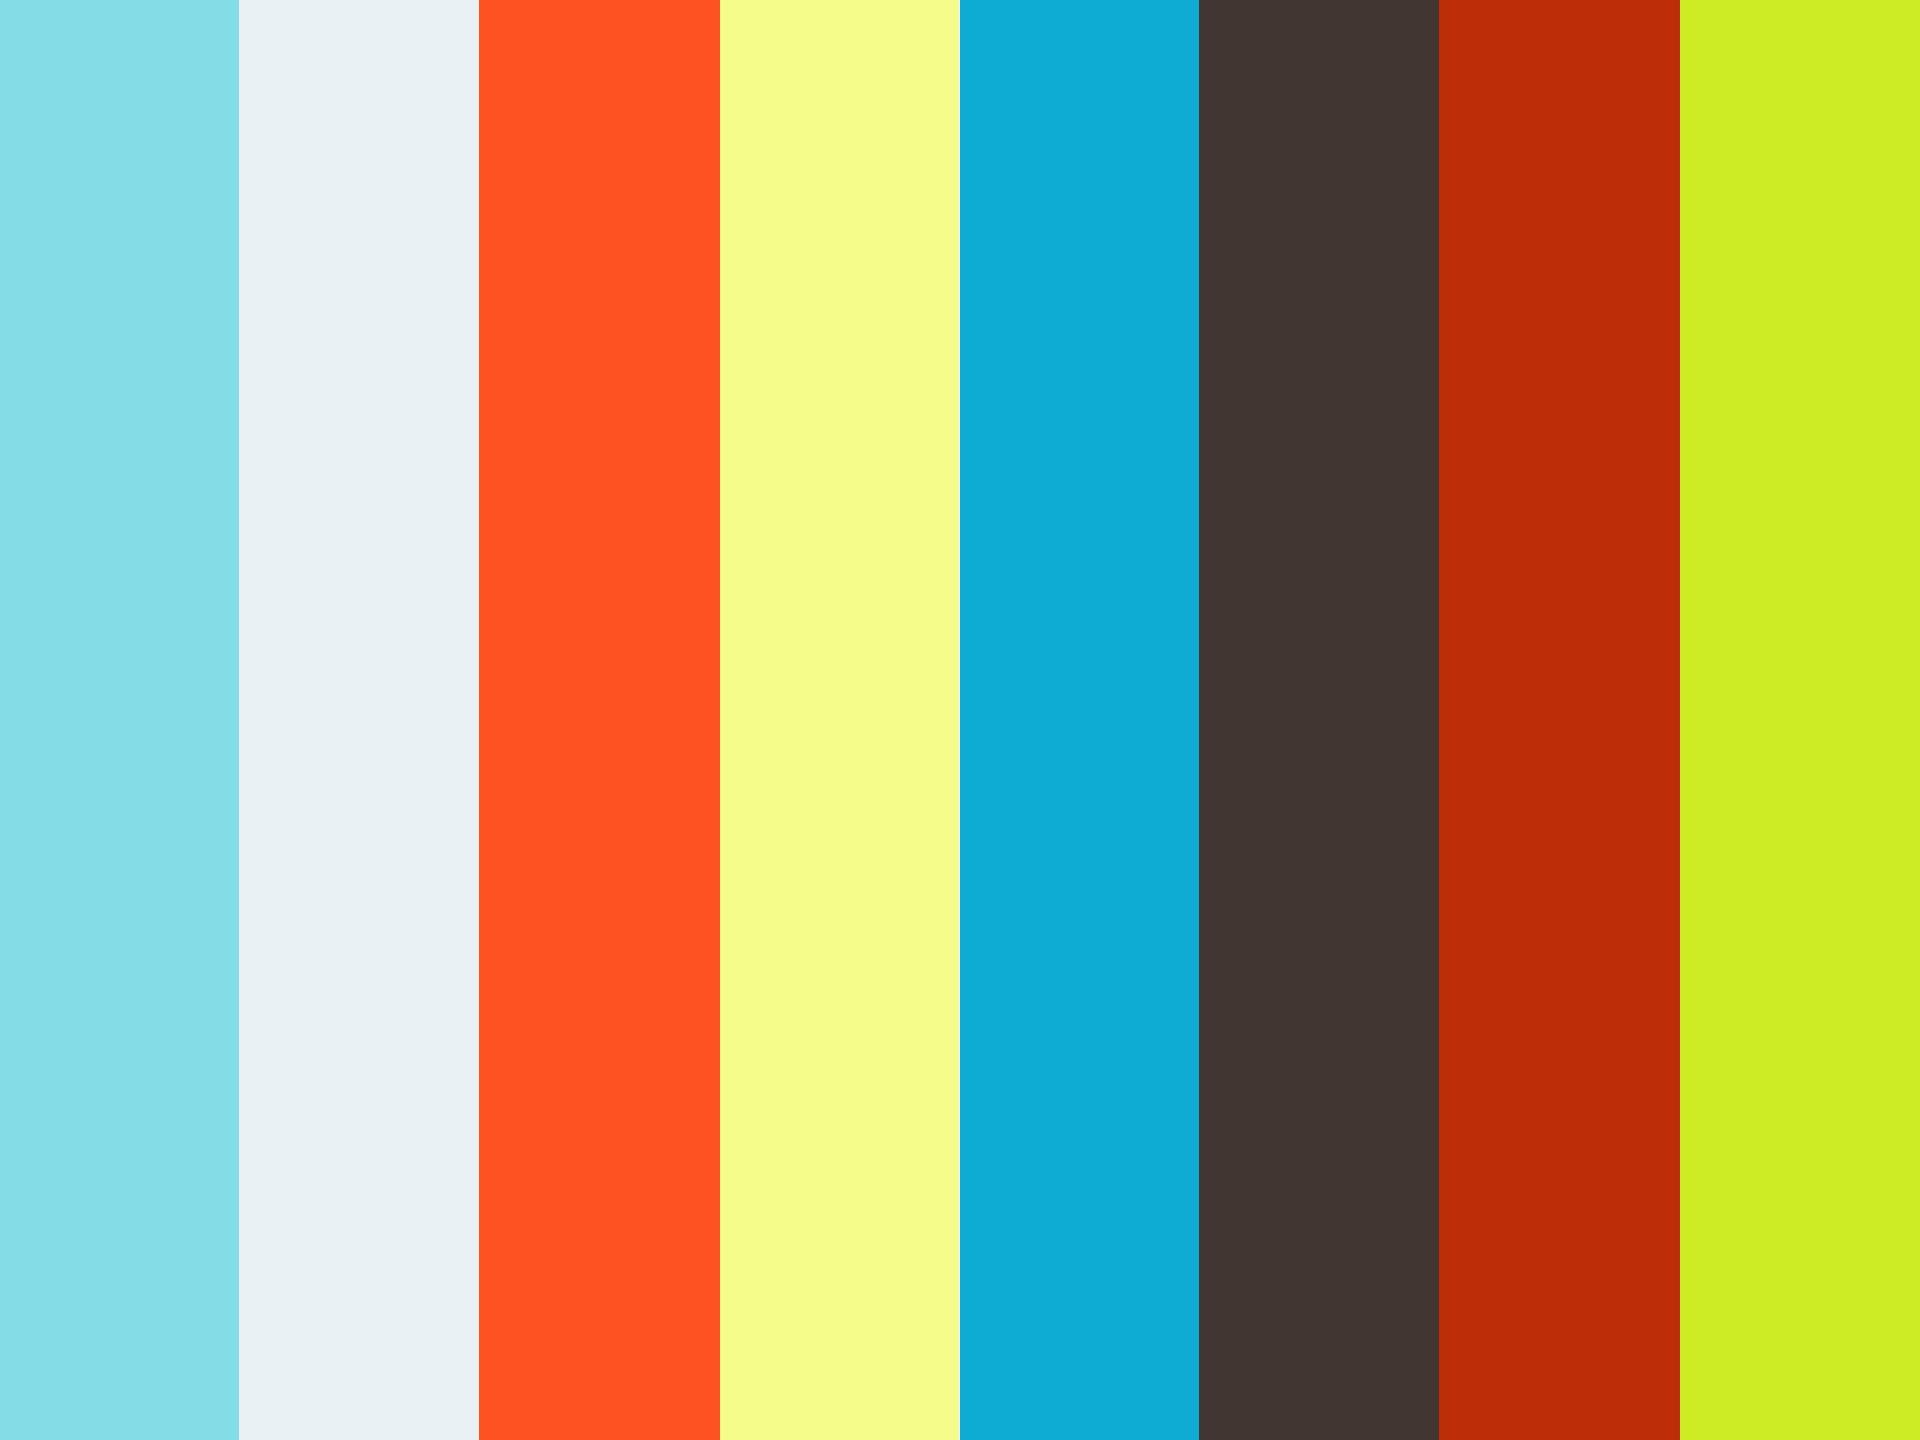 FERRARI 488 - BLUE - 2017